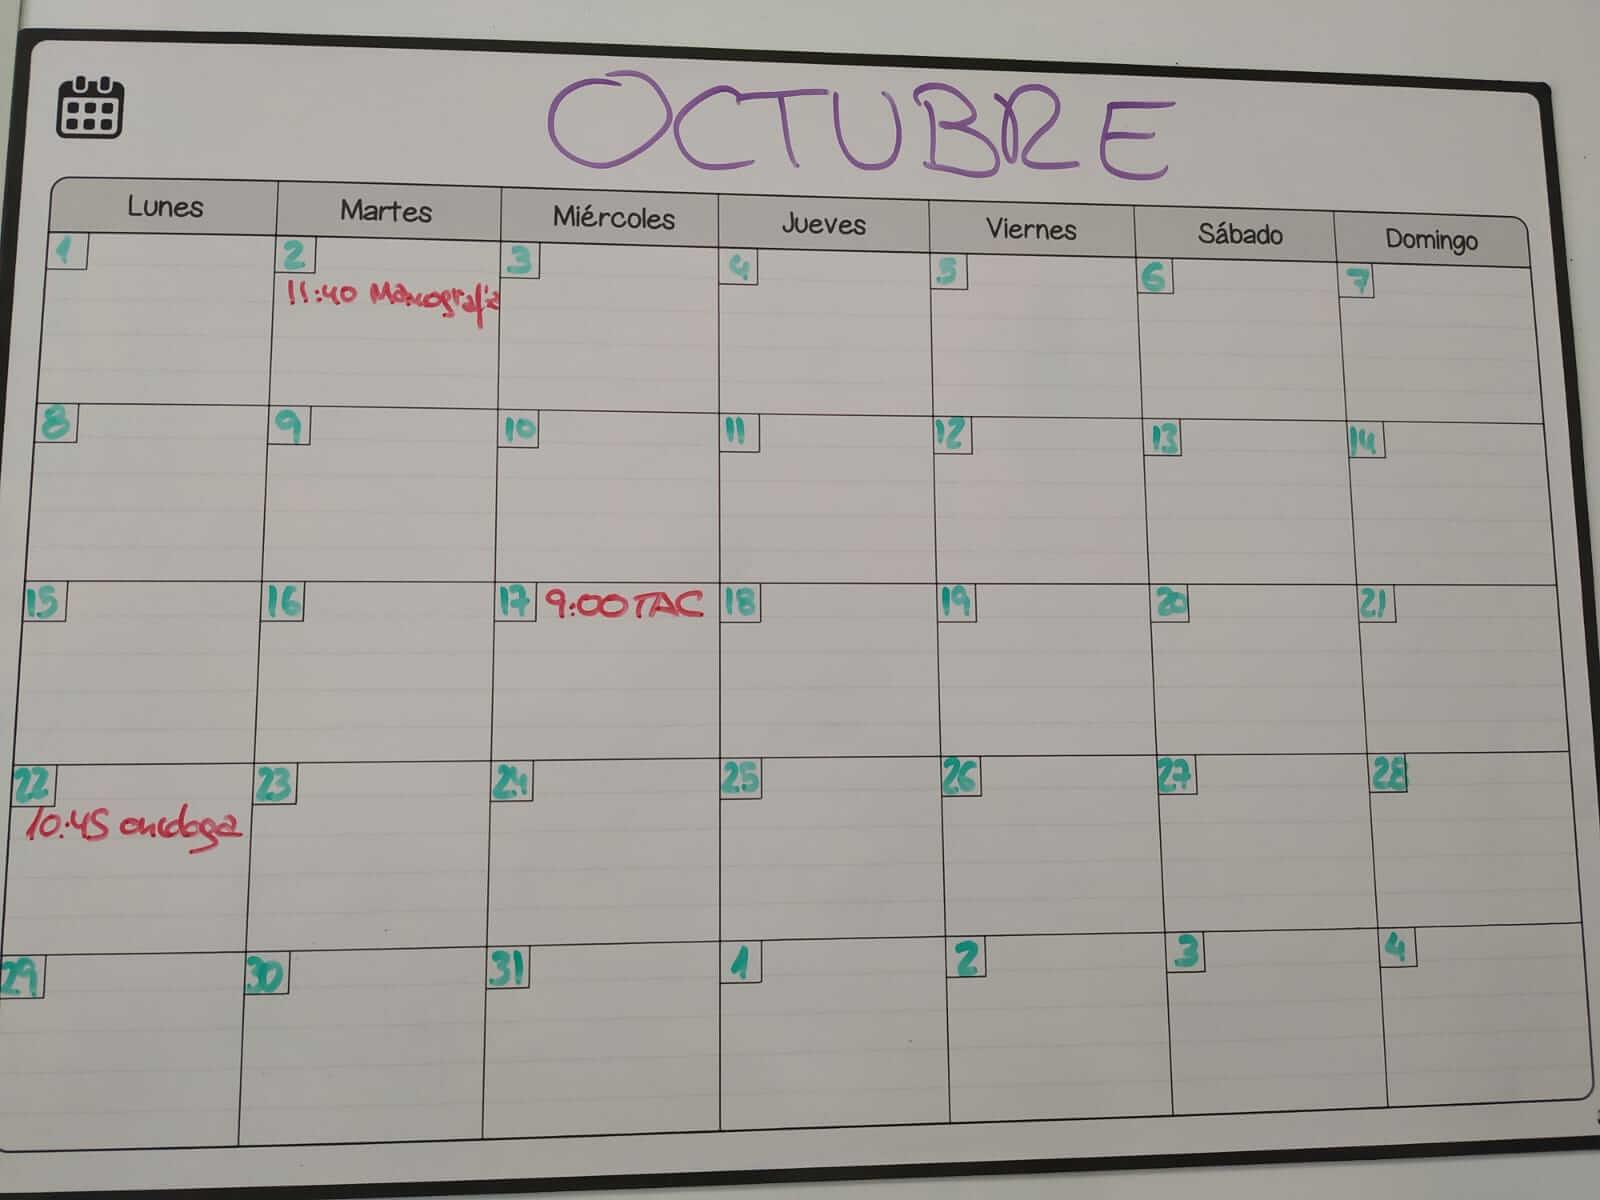 Mes de octubre completo. 3